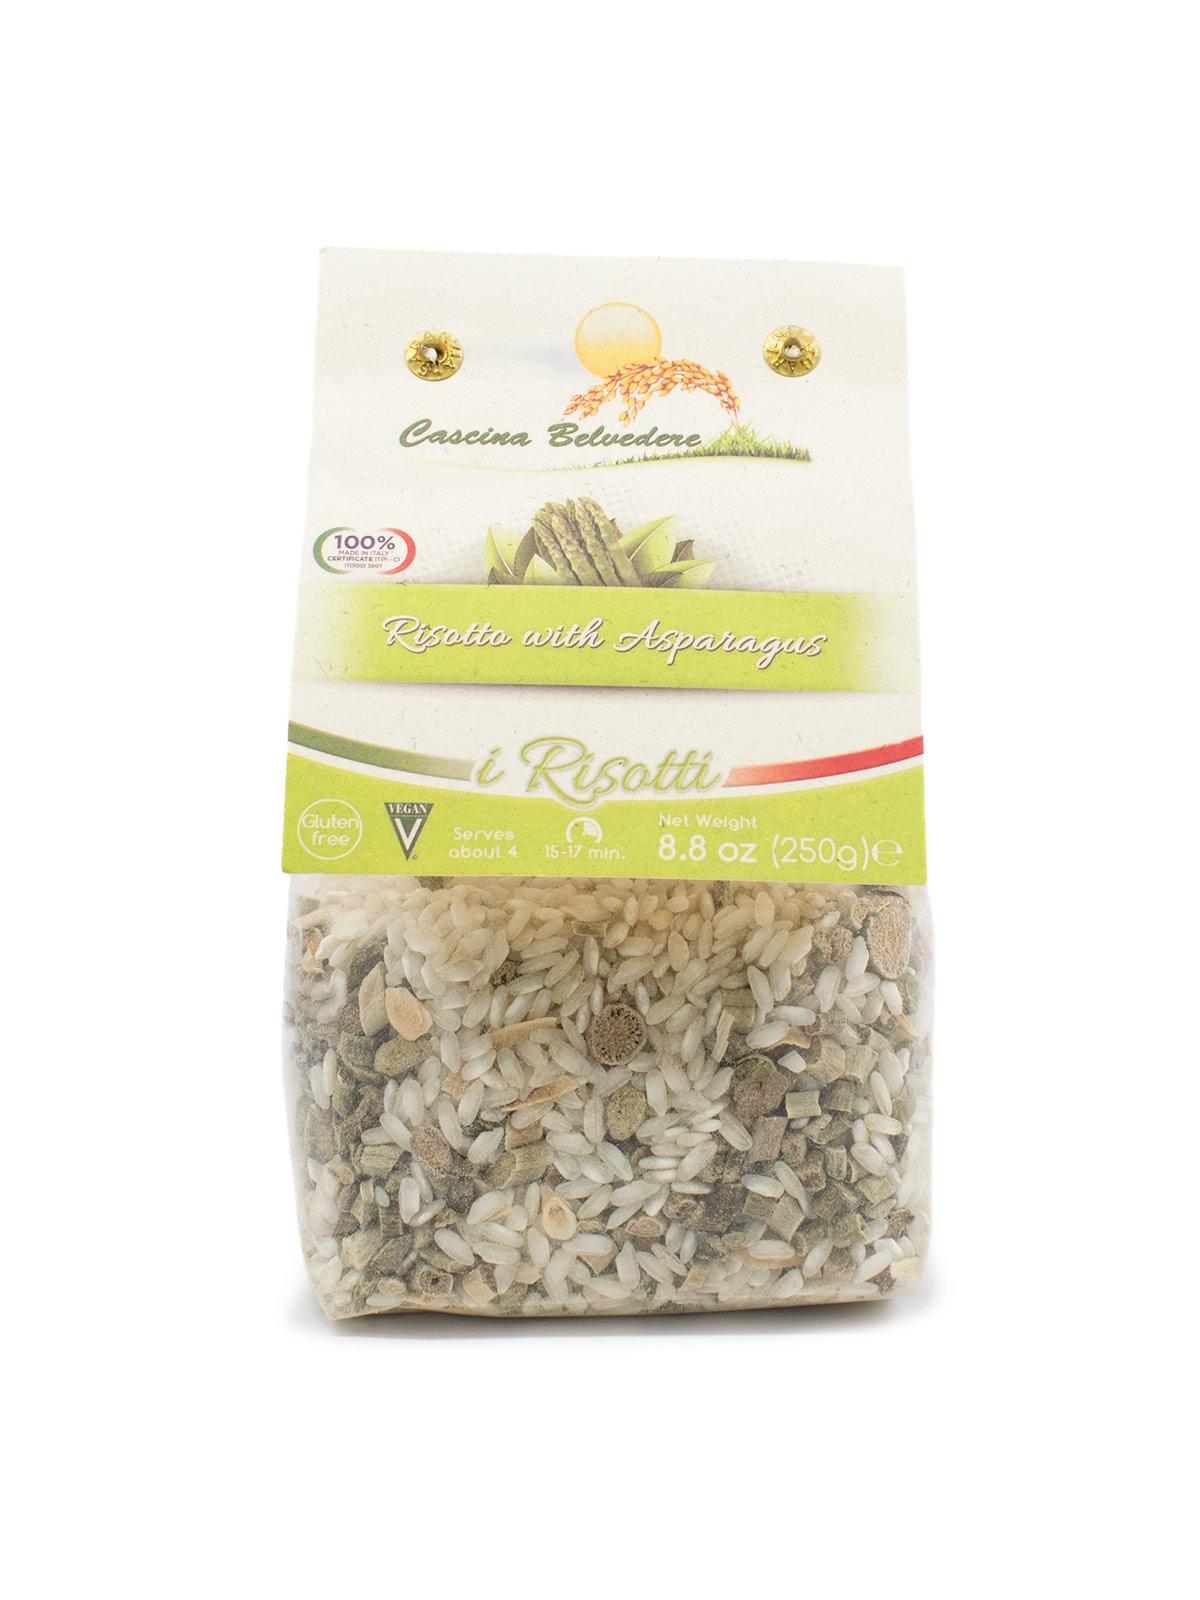 Asparagus Risotto - Pastas, Rice, and Grains - Buon'Italia